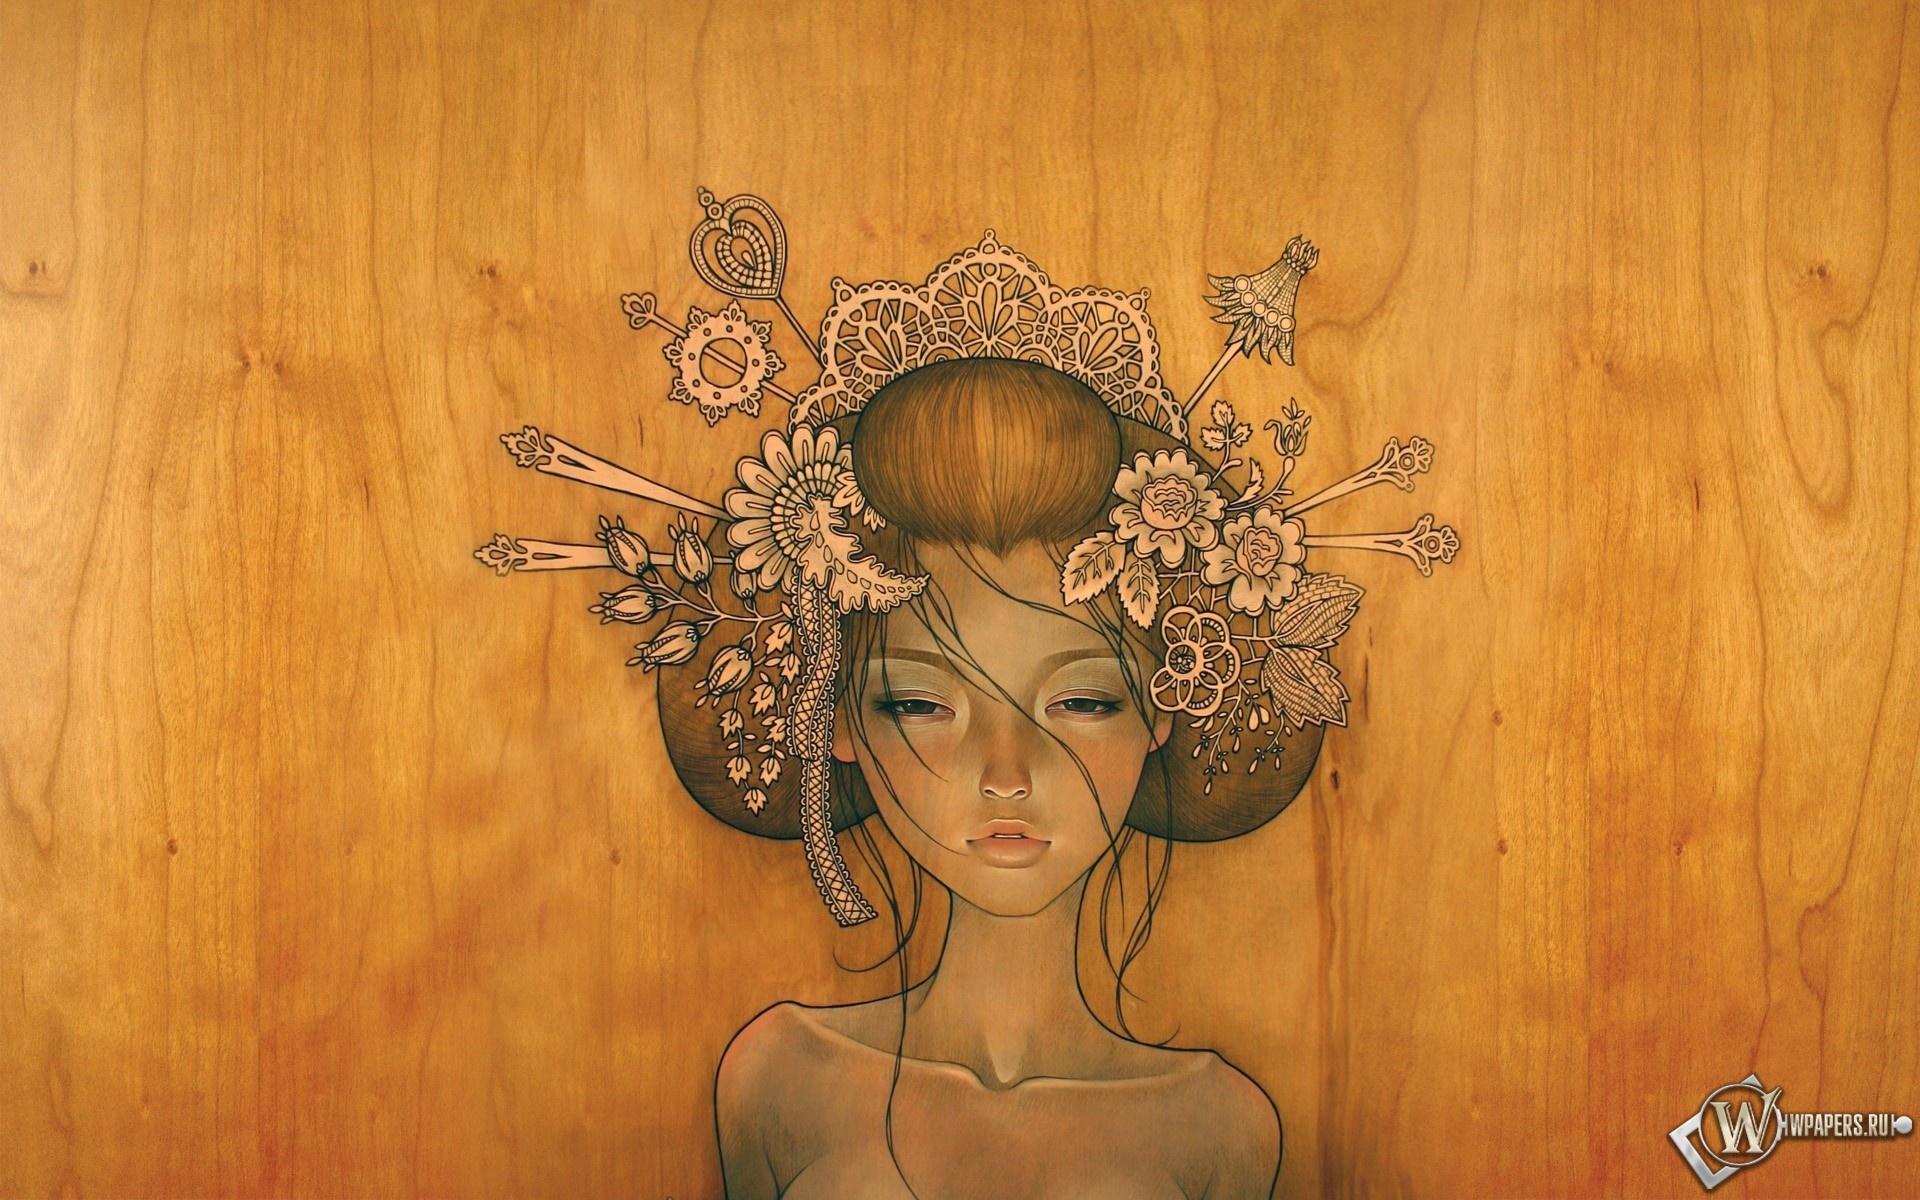 Девушка из дерева 1920x1200